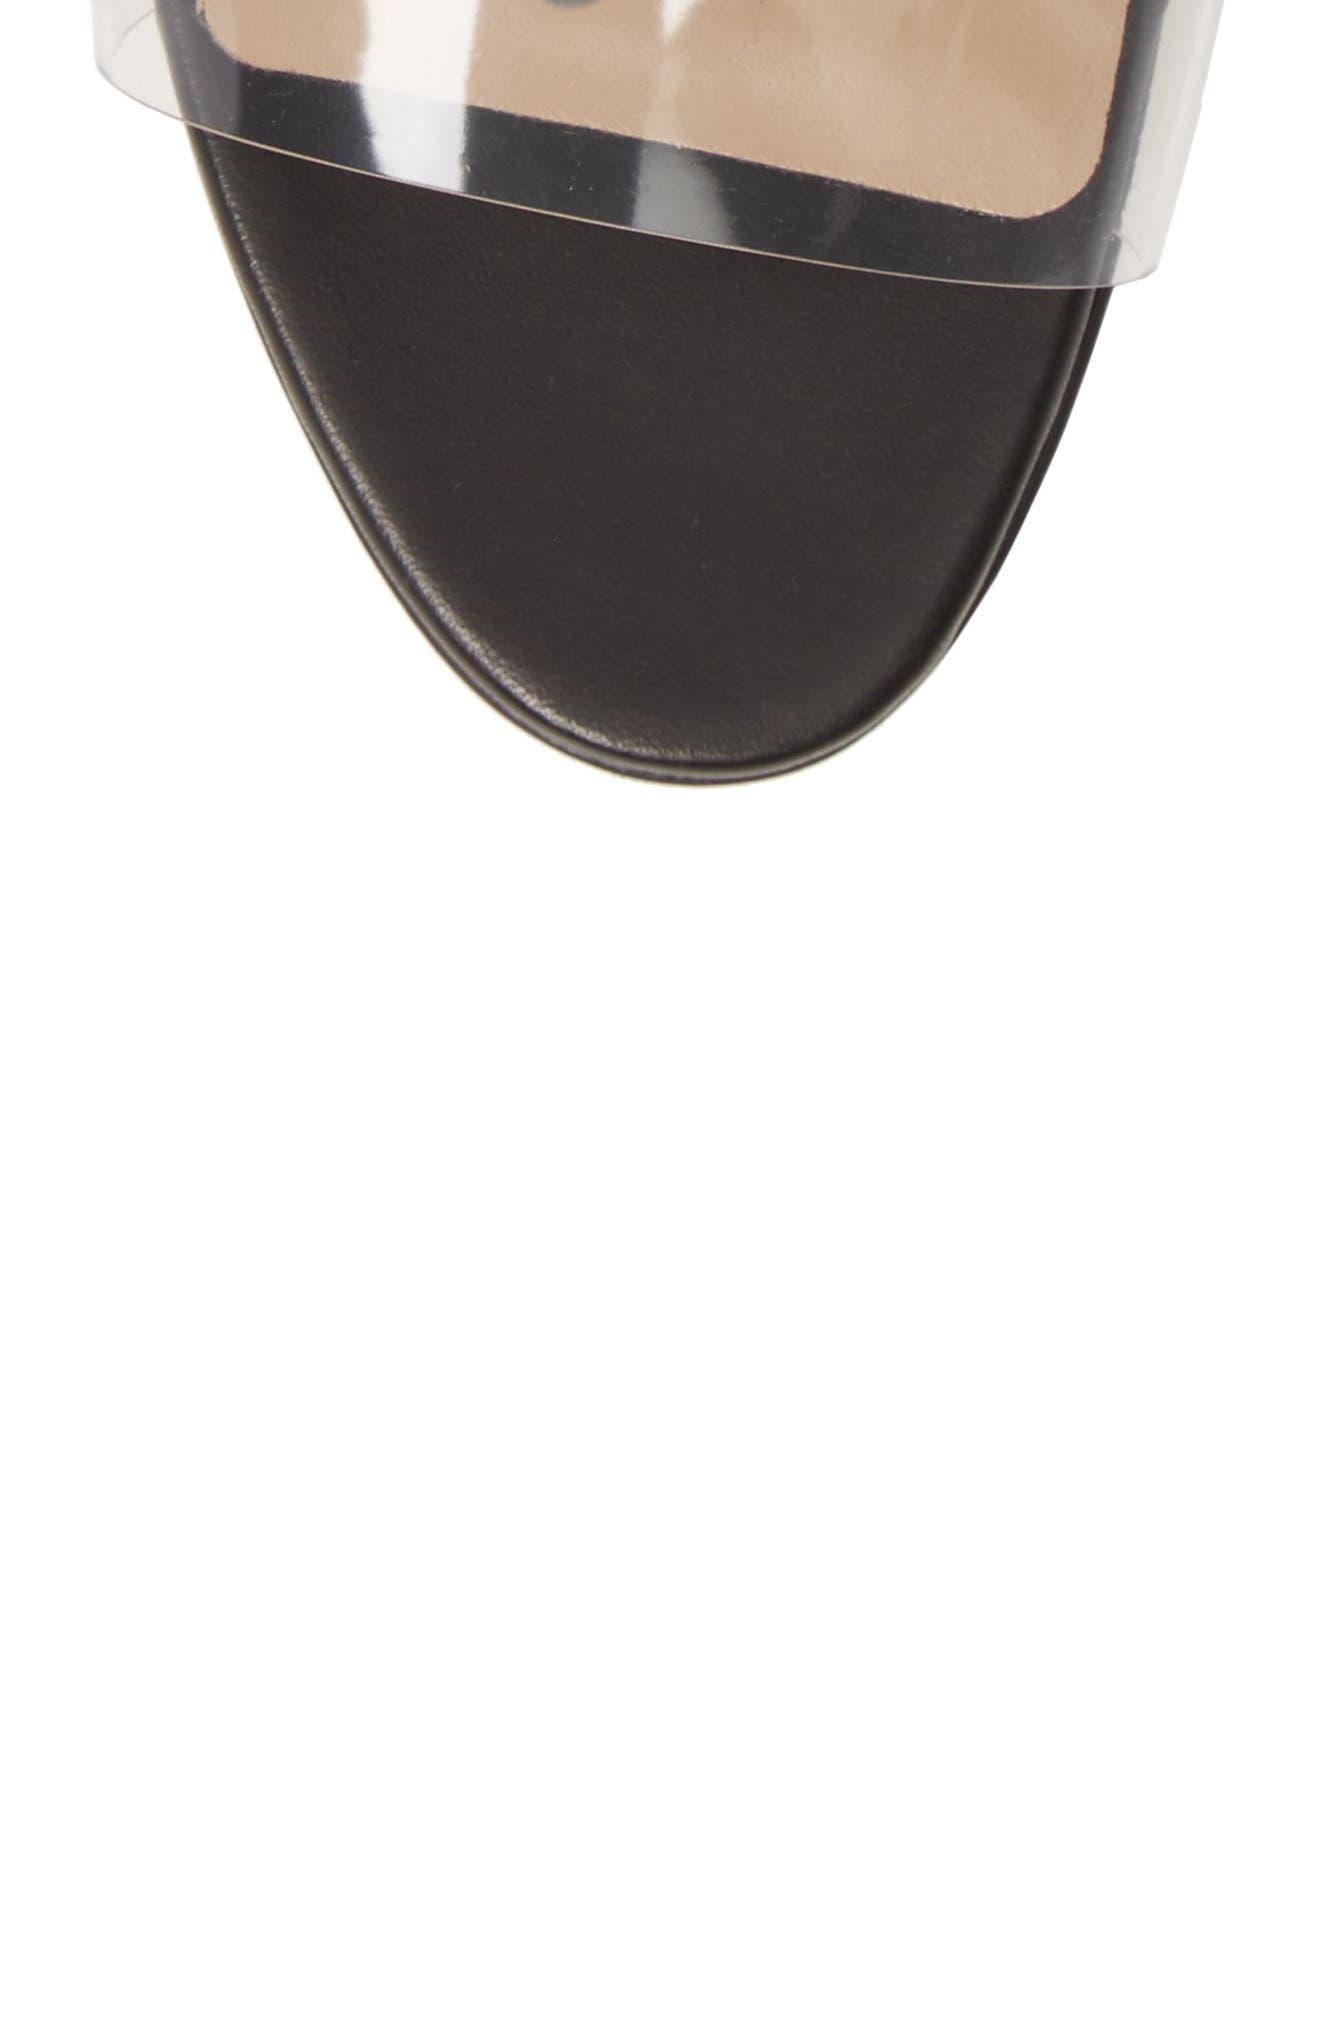 MANOLO BLAHNIK, Estro Ankle Tie Sandal, Alternate thumbnail 5, color, BLACK LEATHER